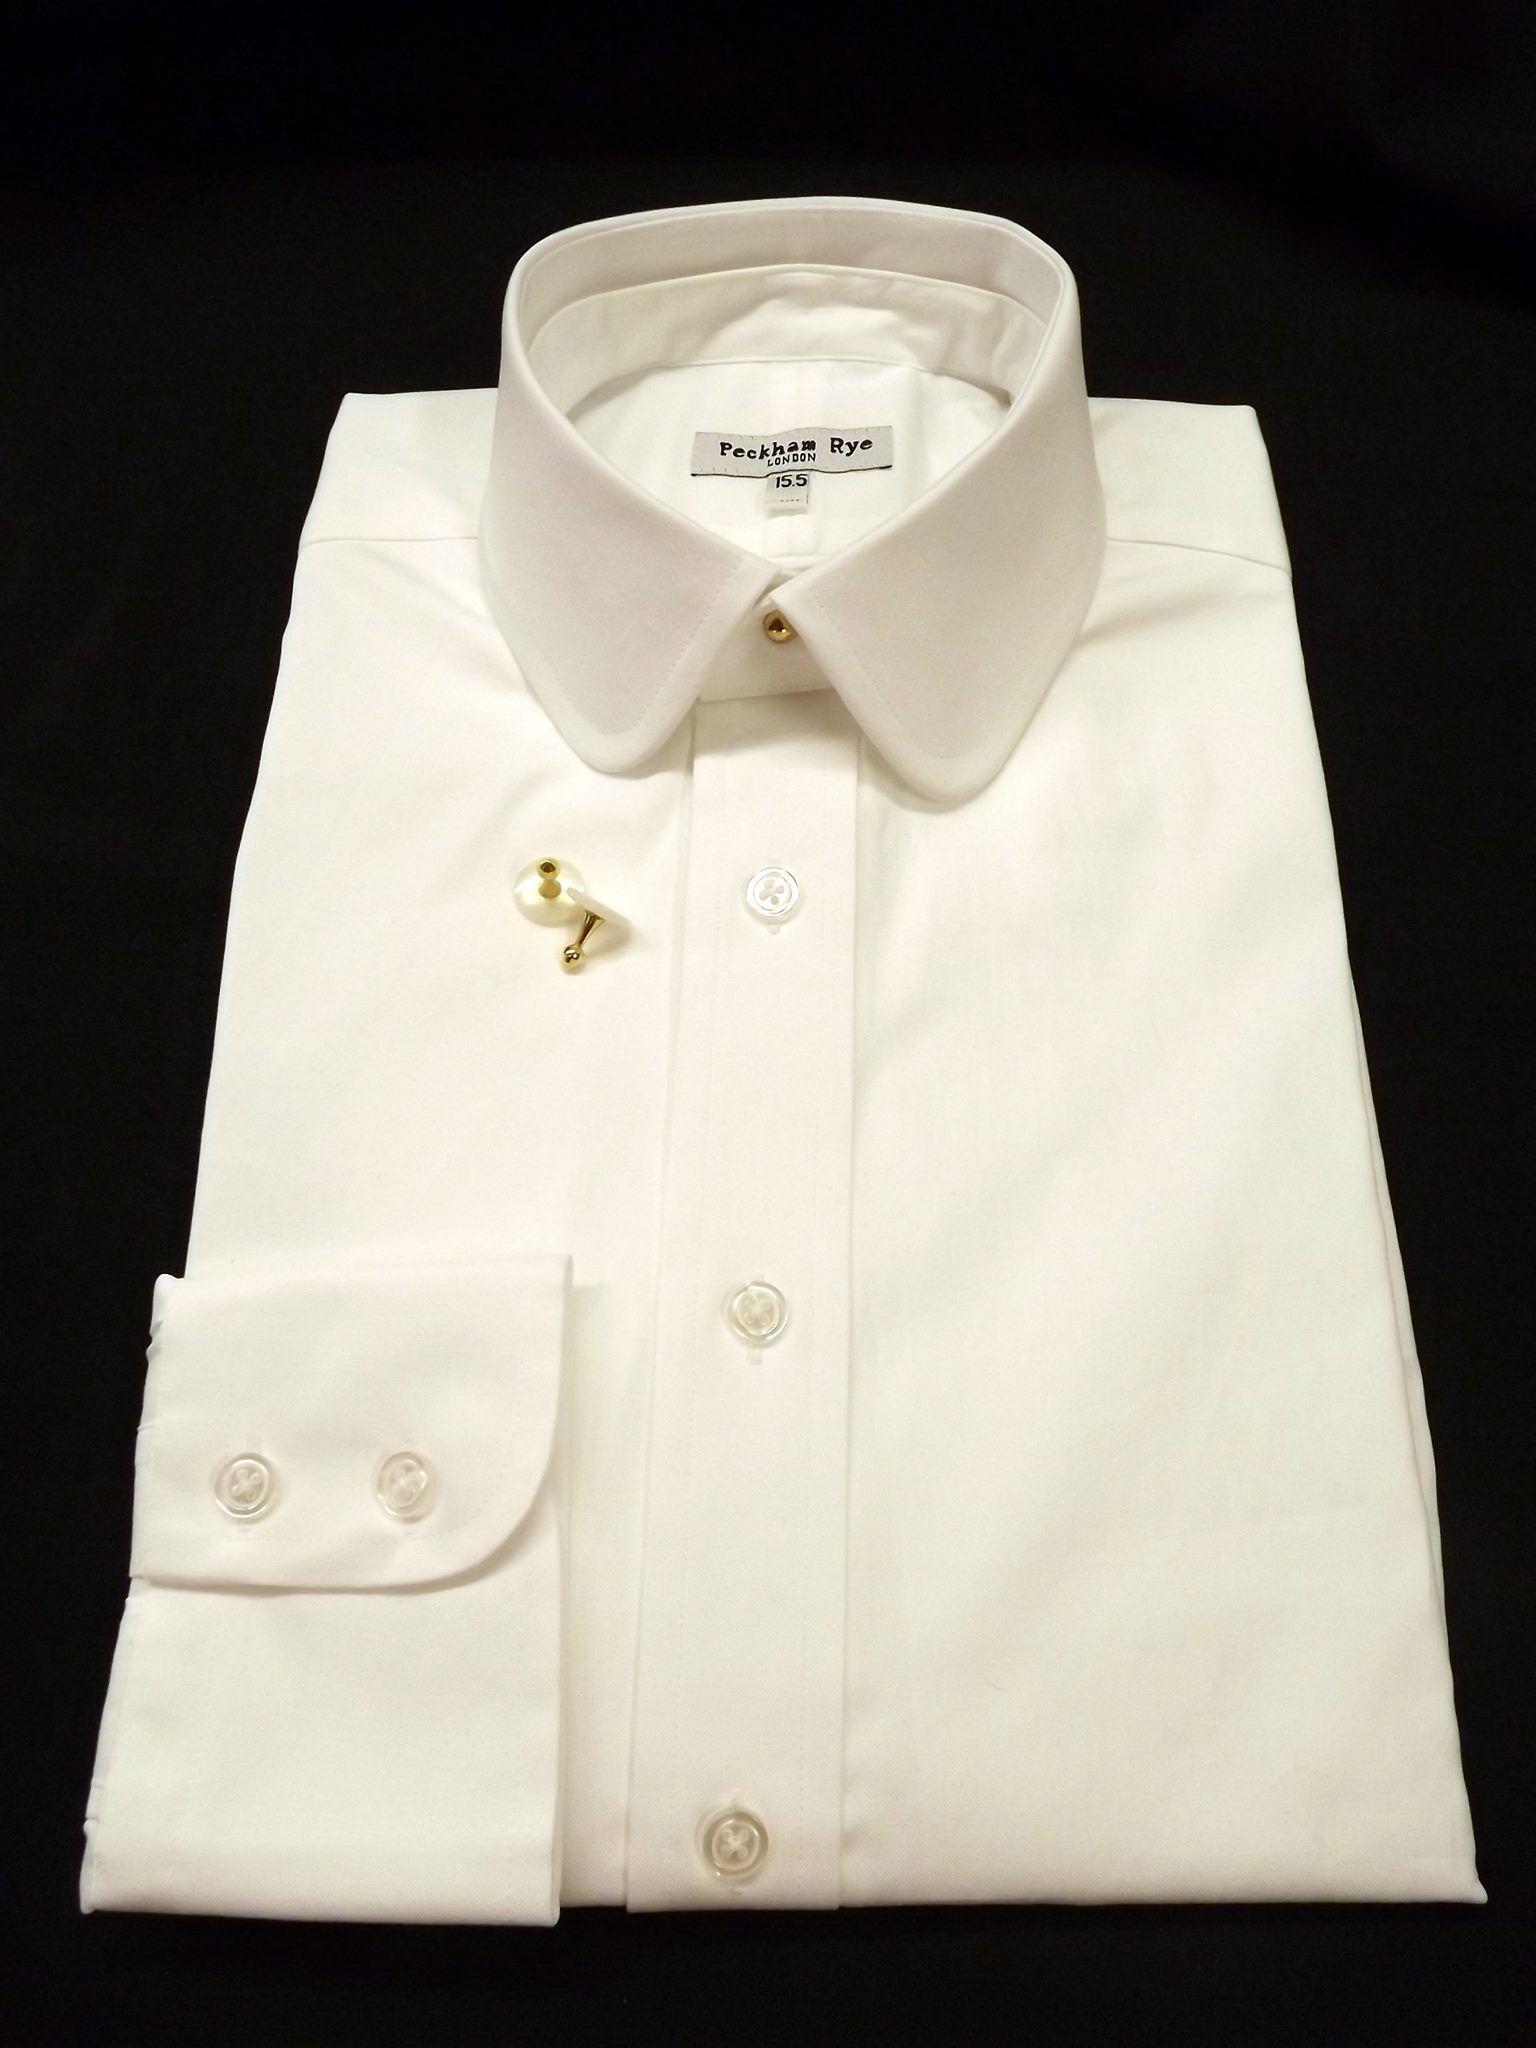 "15d5ec638e Peckham Rye ""Pogson"" Detachable Collar Shirt. All very smart"